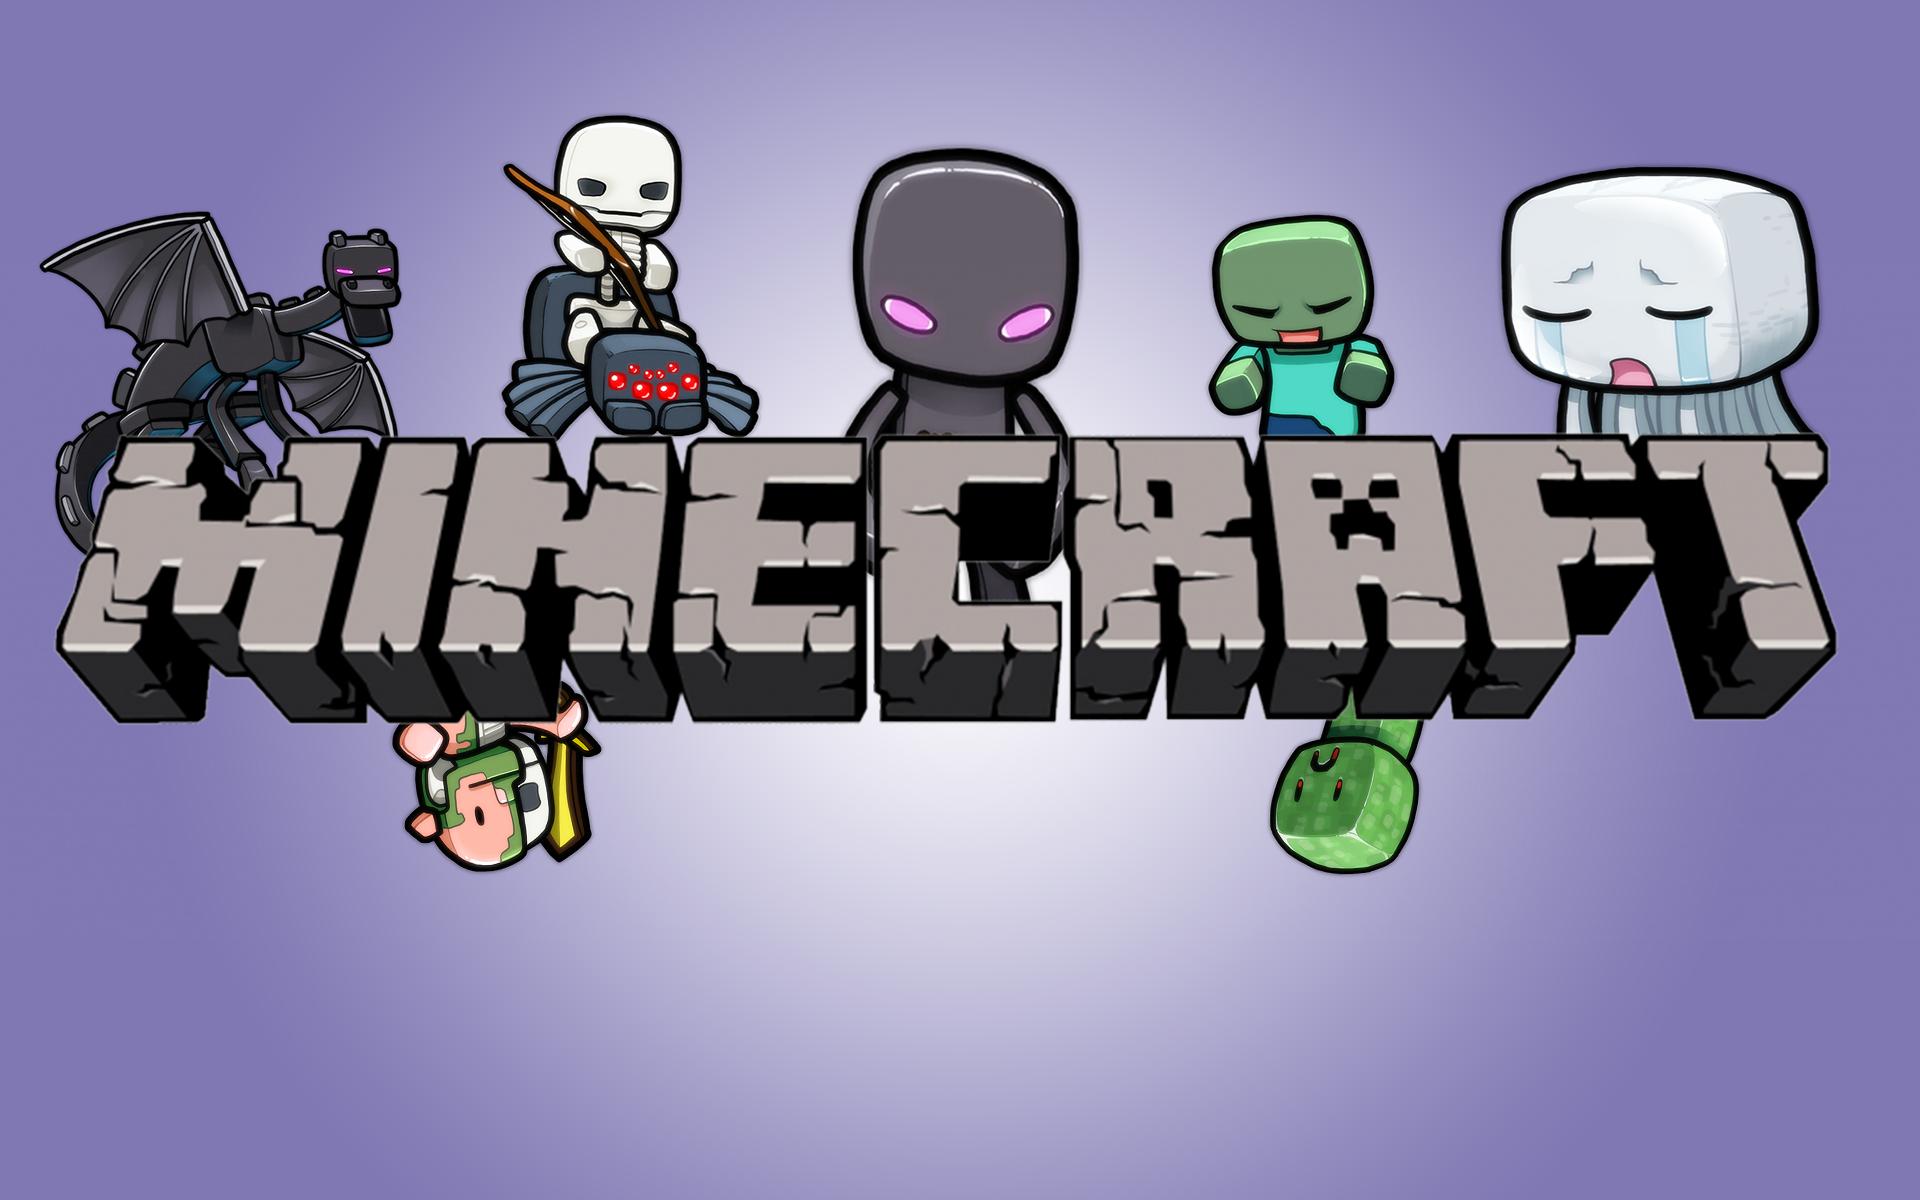 Minecraft Cartoon Wallpapers 15 Colors By Gamex101 Deviantart Com On Deviantart